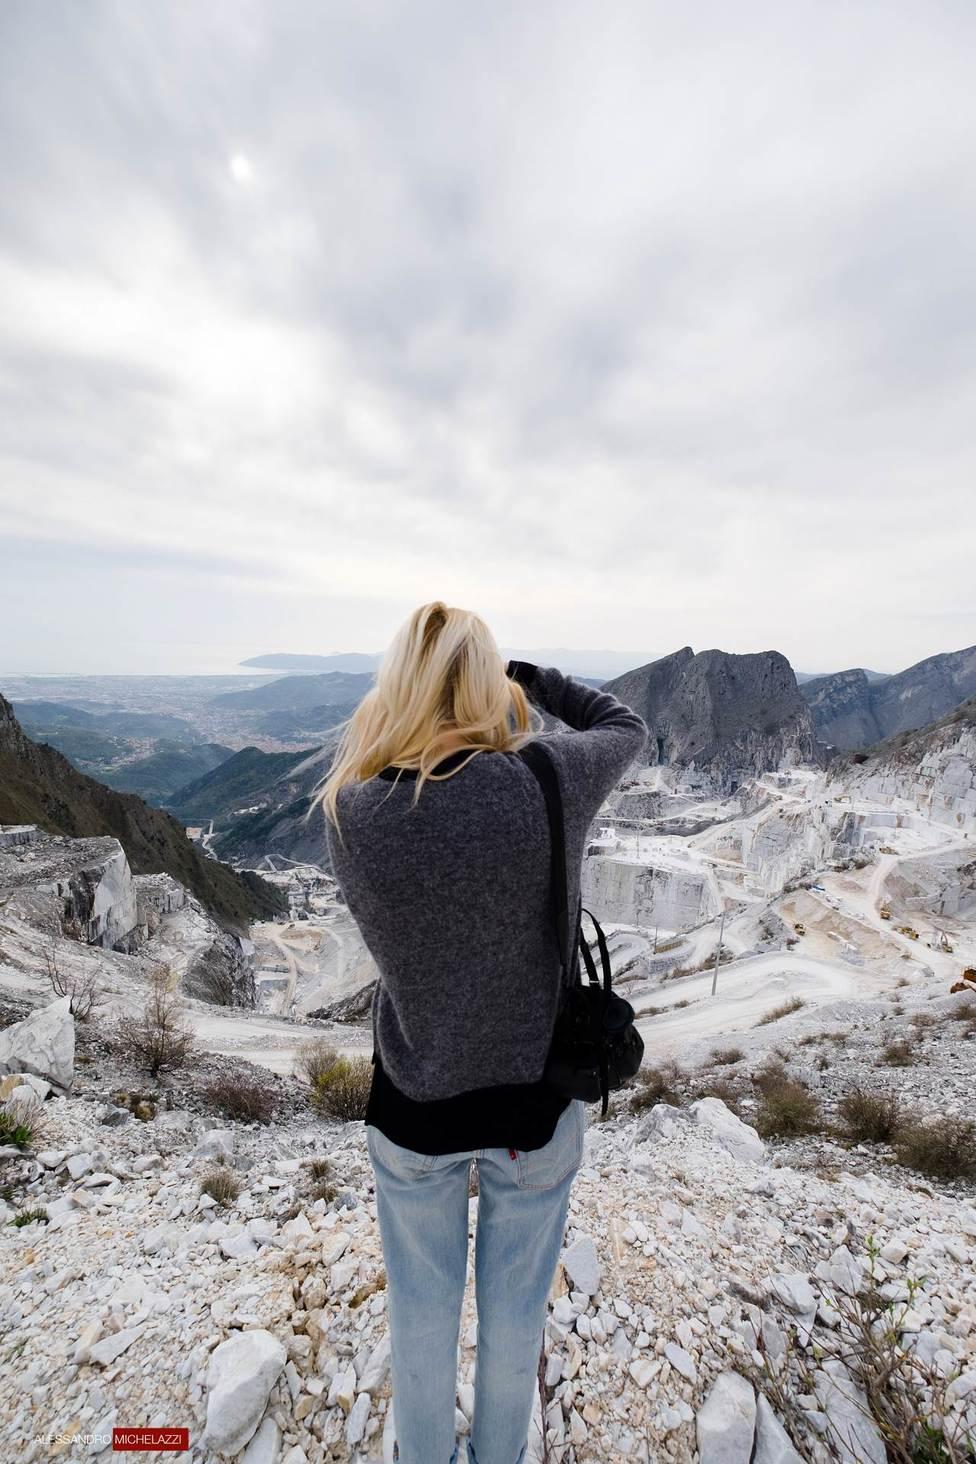 carrara-marble-cave-photos-17